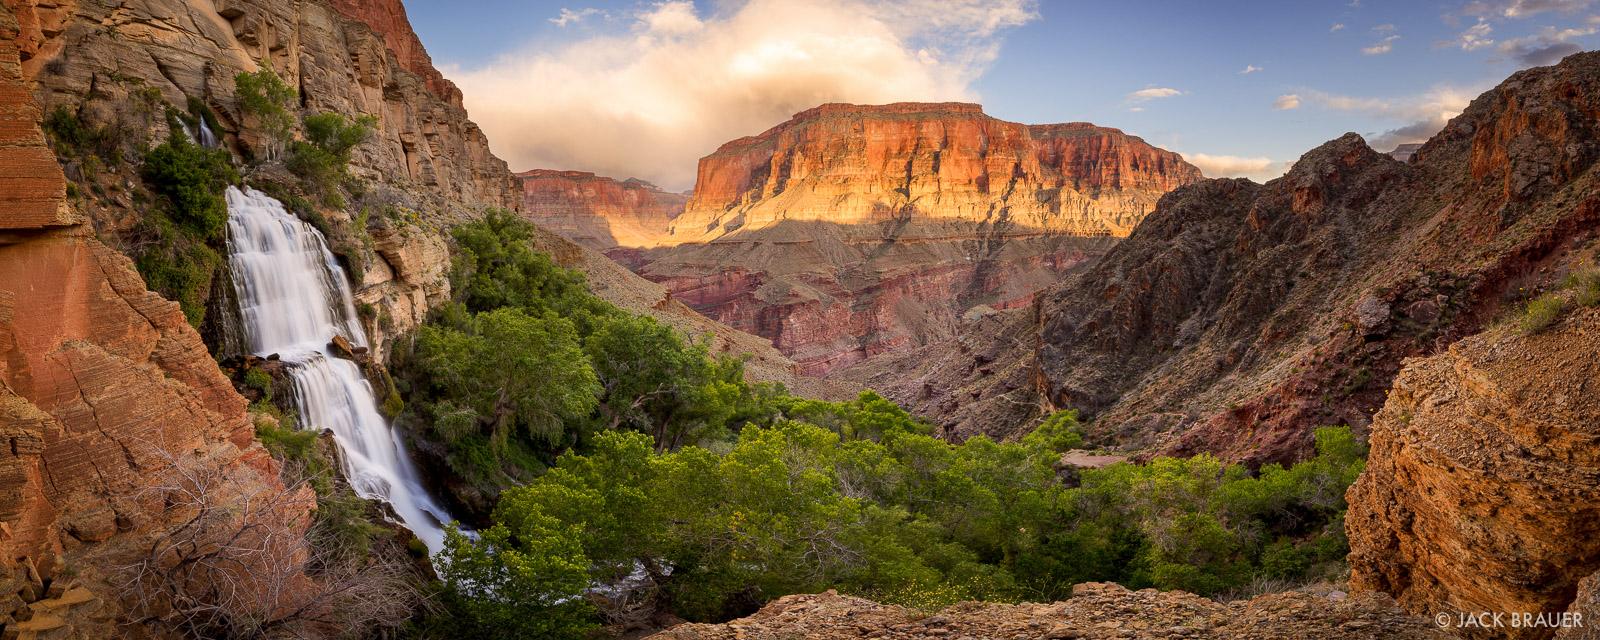 Arizona,Grand Canyon,Thunder River,panorama,waterfall, photo